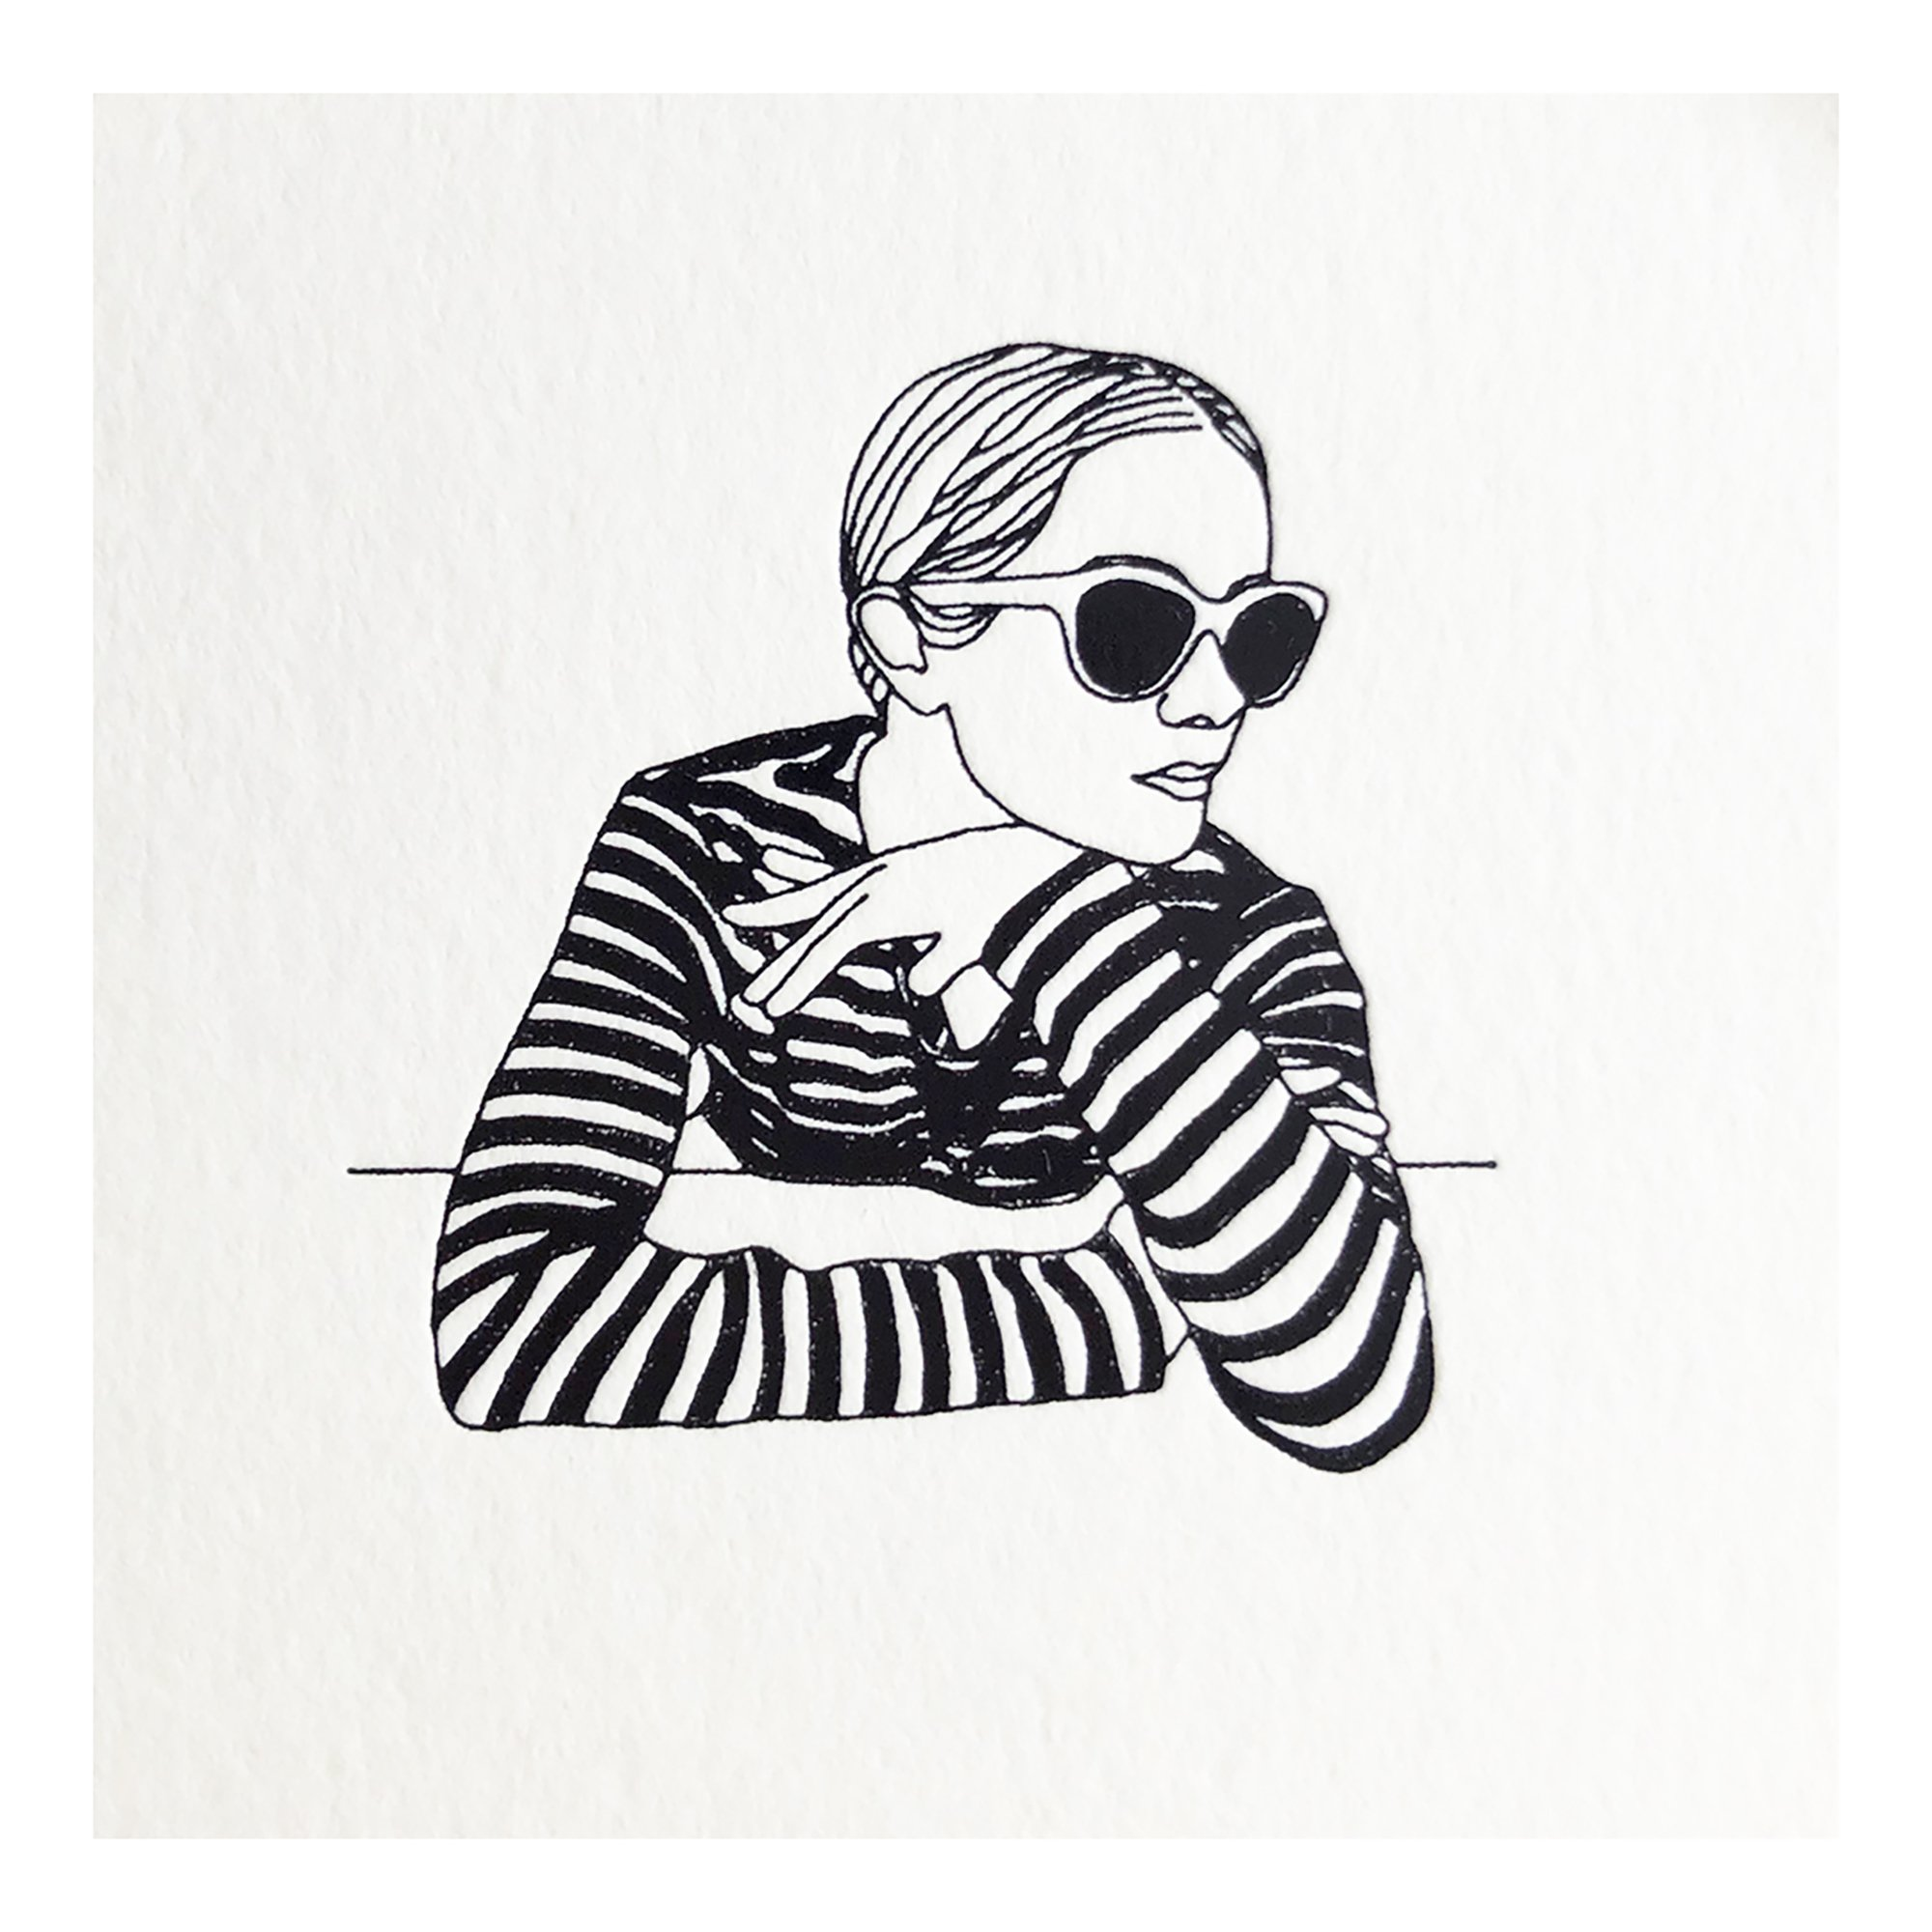 Breton_Girl_illos_etsy_2000